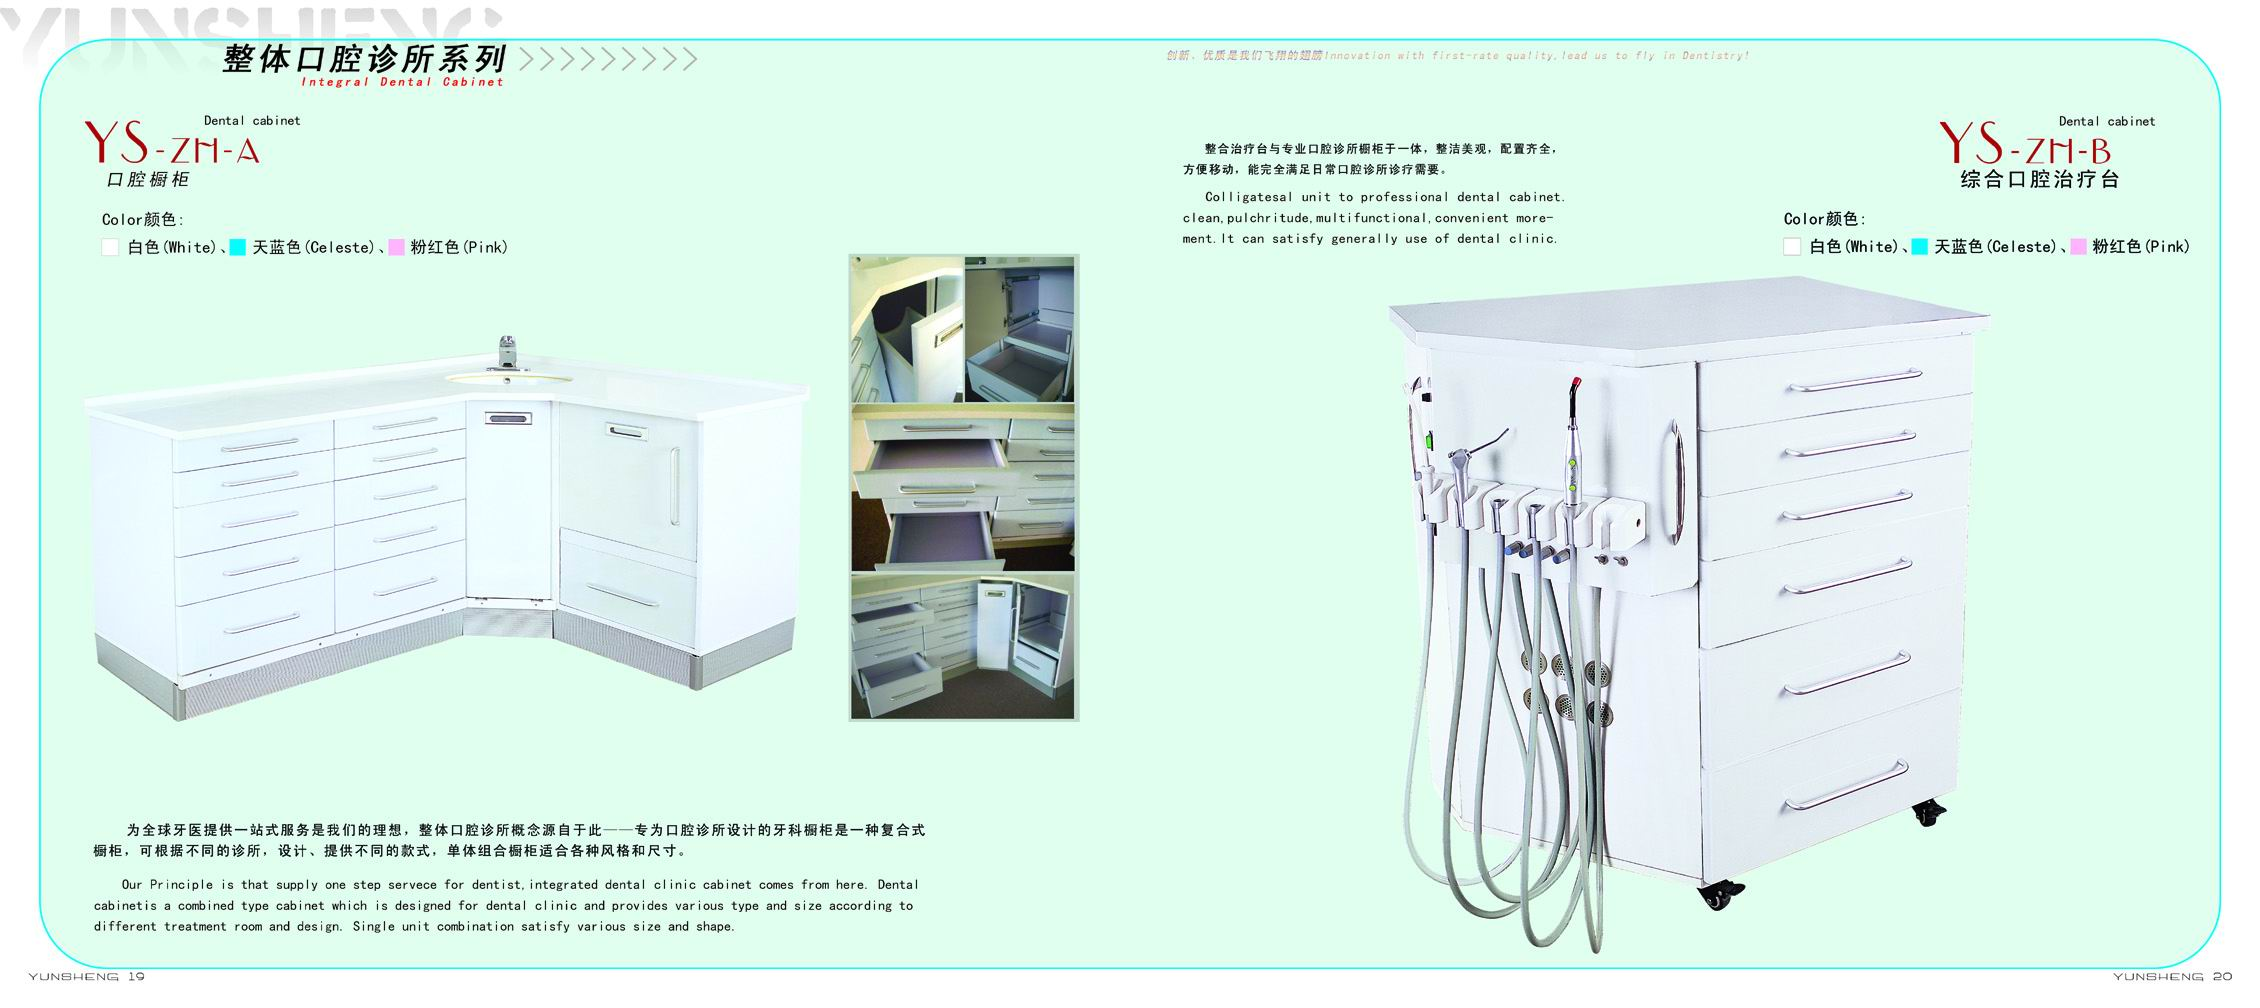 dental supply mobile unit dentaire m dicale instrument dentaire clinique armoire vendre d. Black Bedroom Furniture Sets. Home Design Ideas